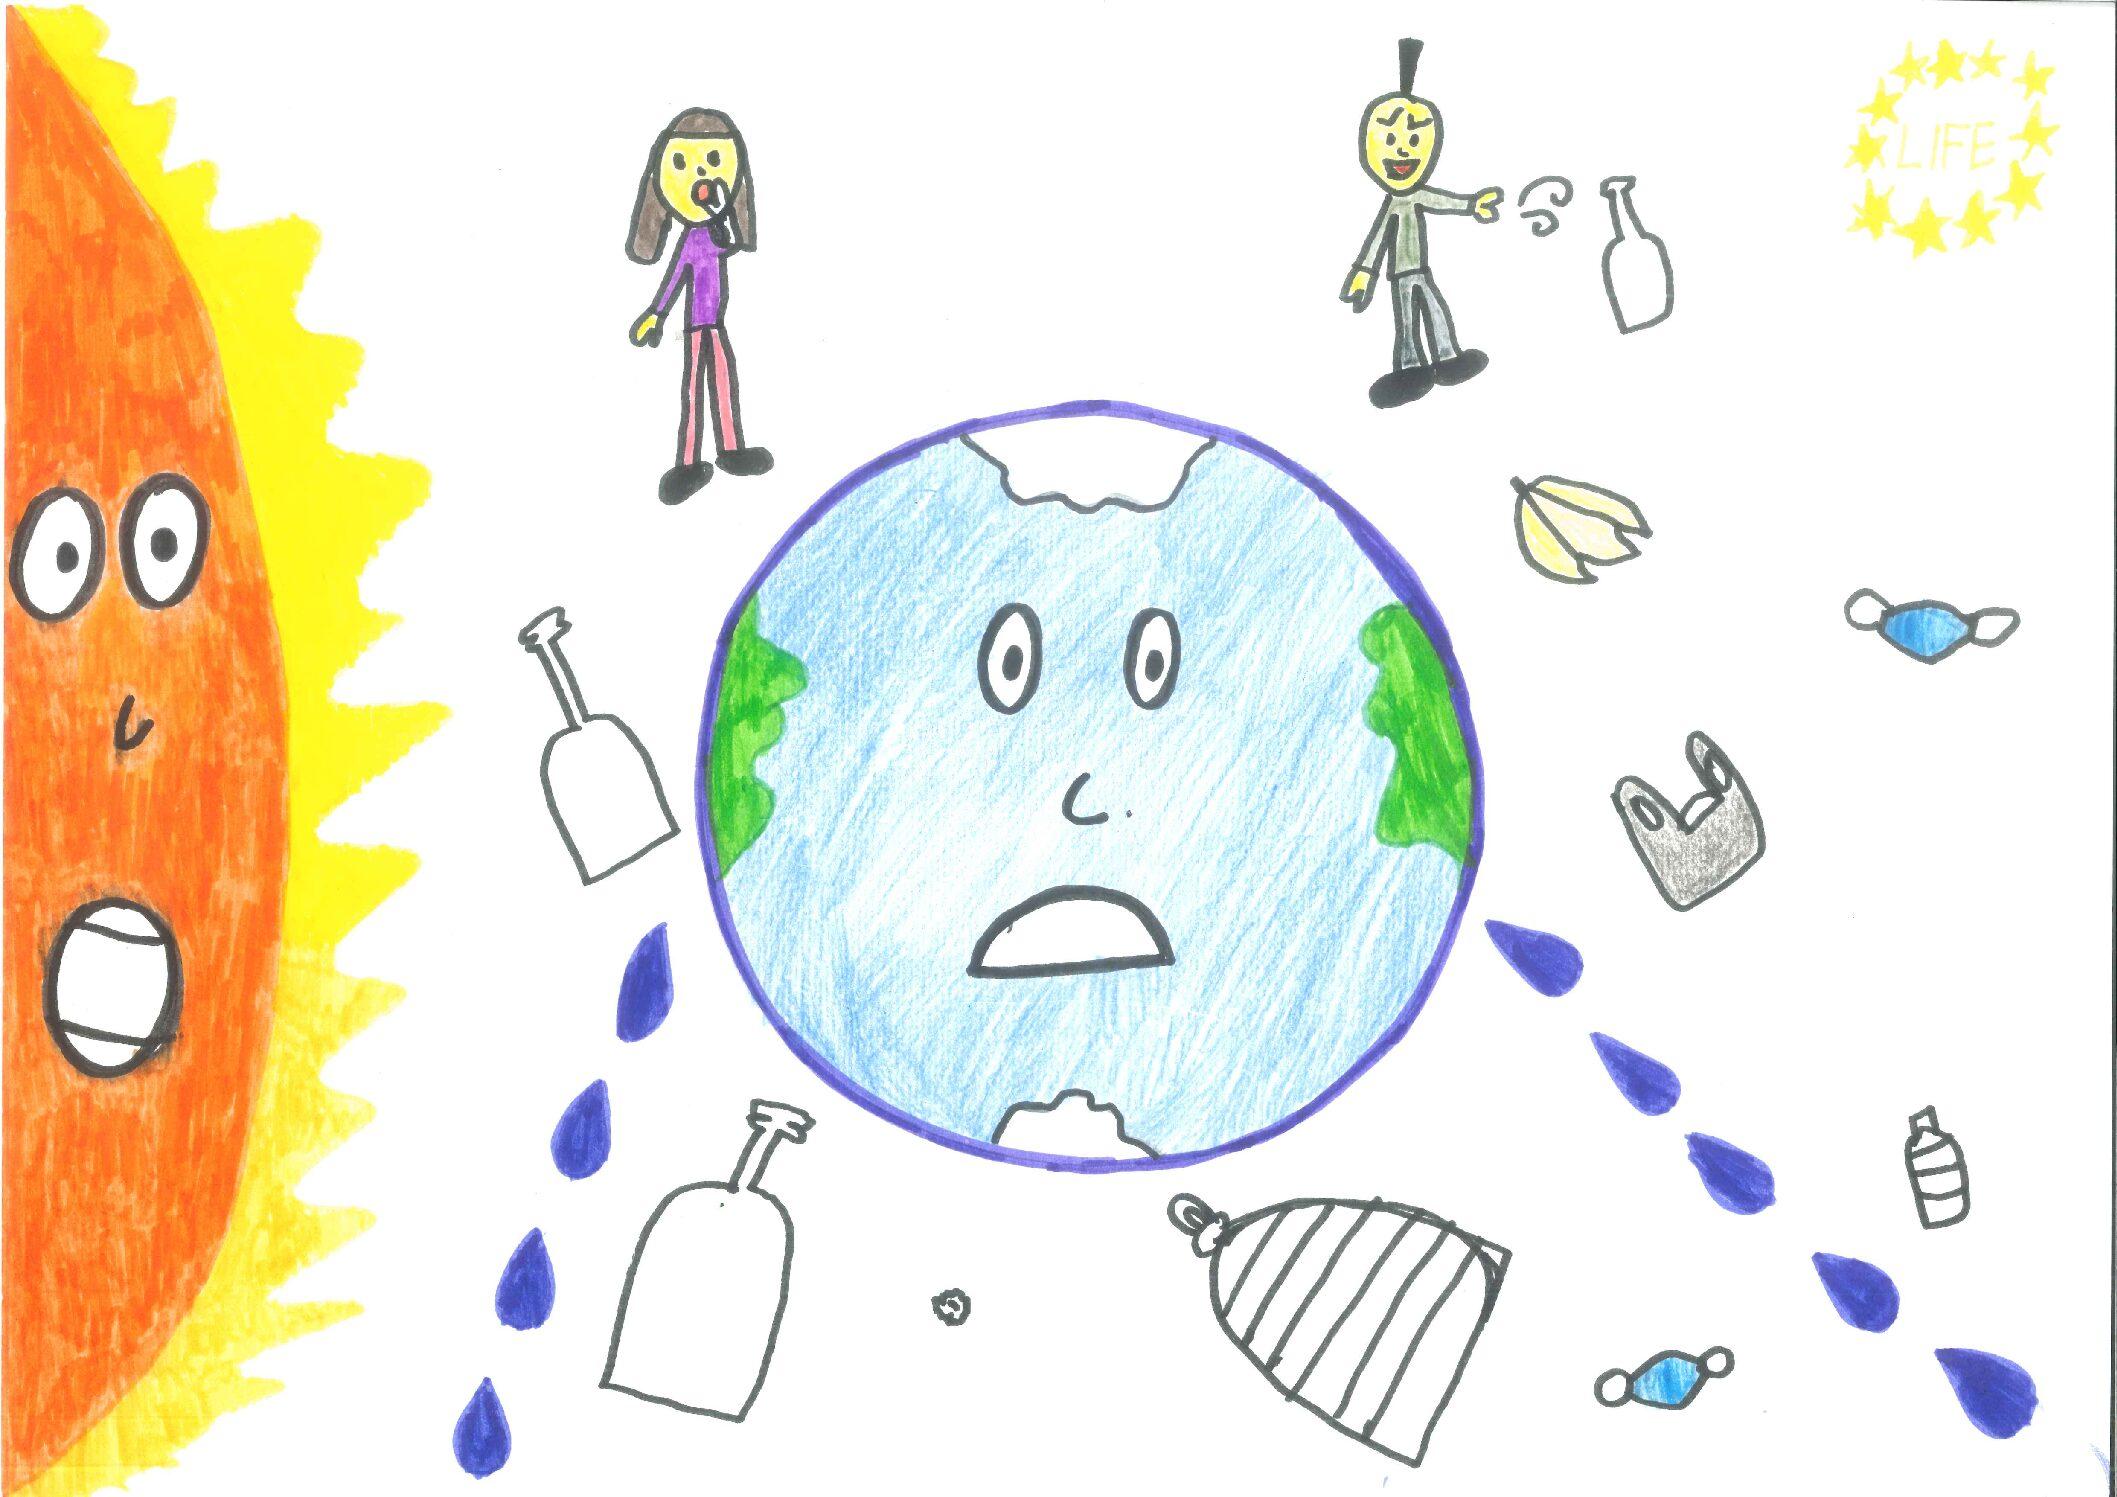 Živa Petrovič: Prihodnost našega planeta